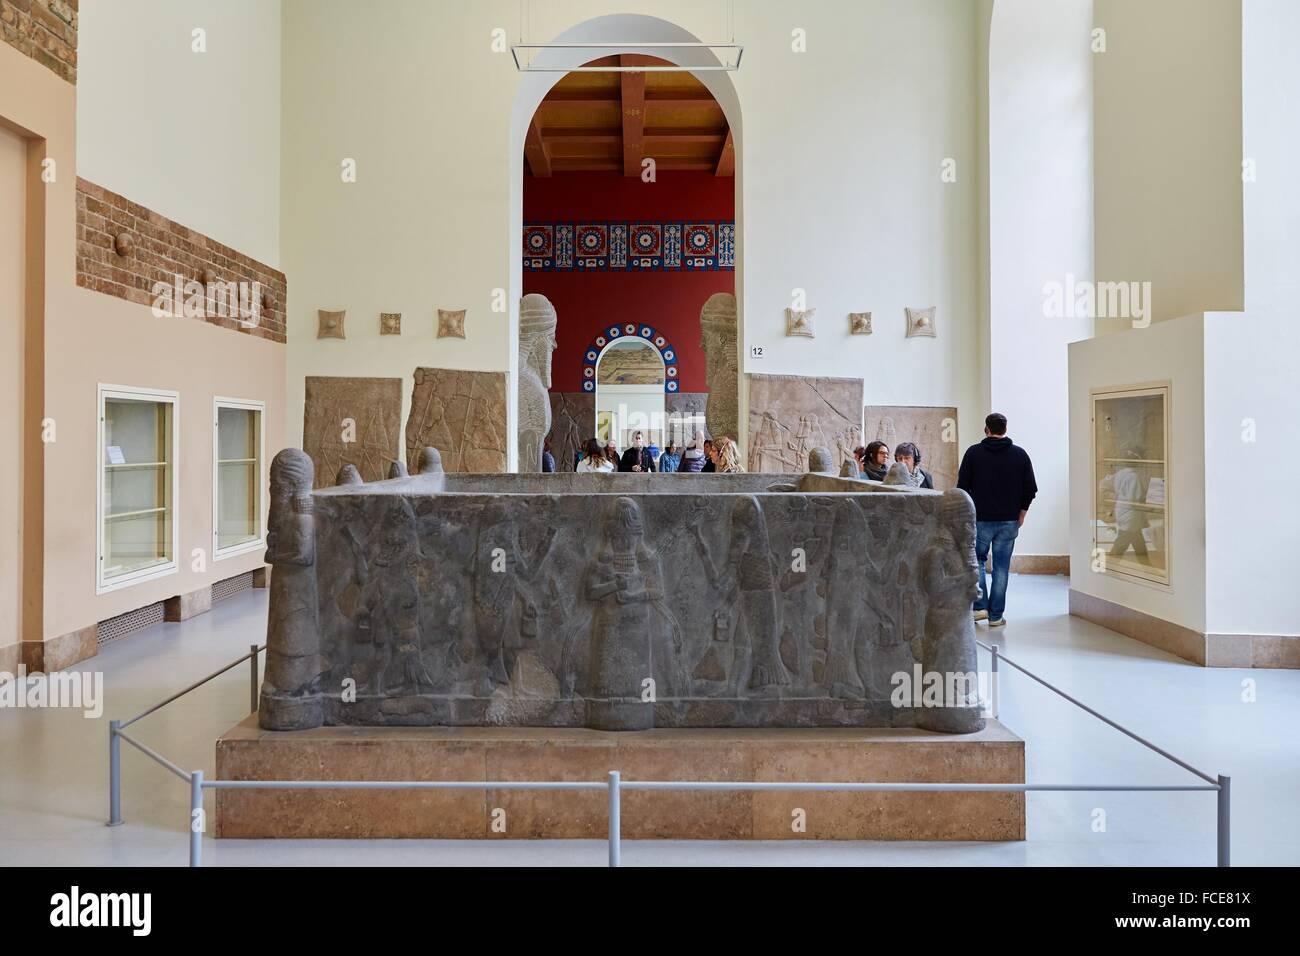 Reconstruction of Assyrian Palace, Pergamon Museum, Berlin, Germany. - Stock Image